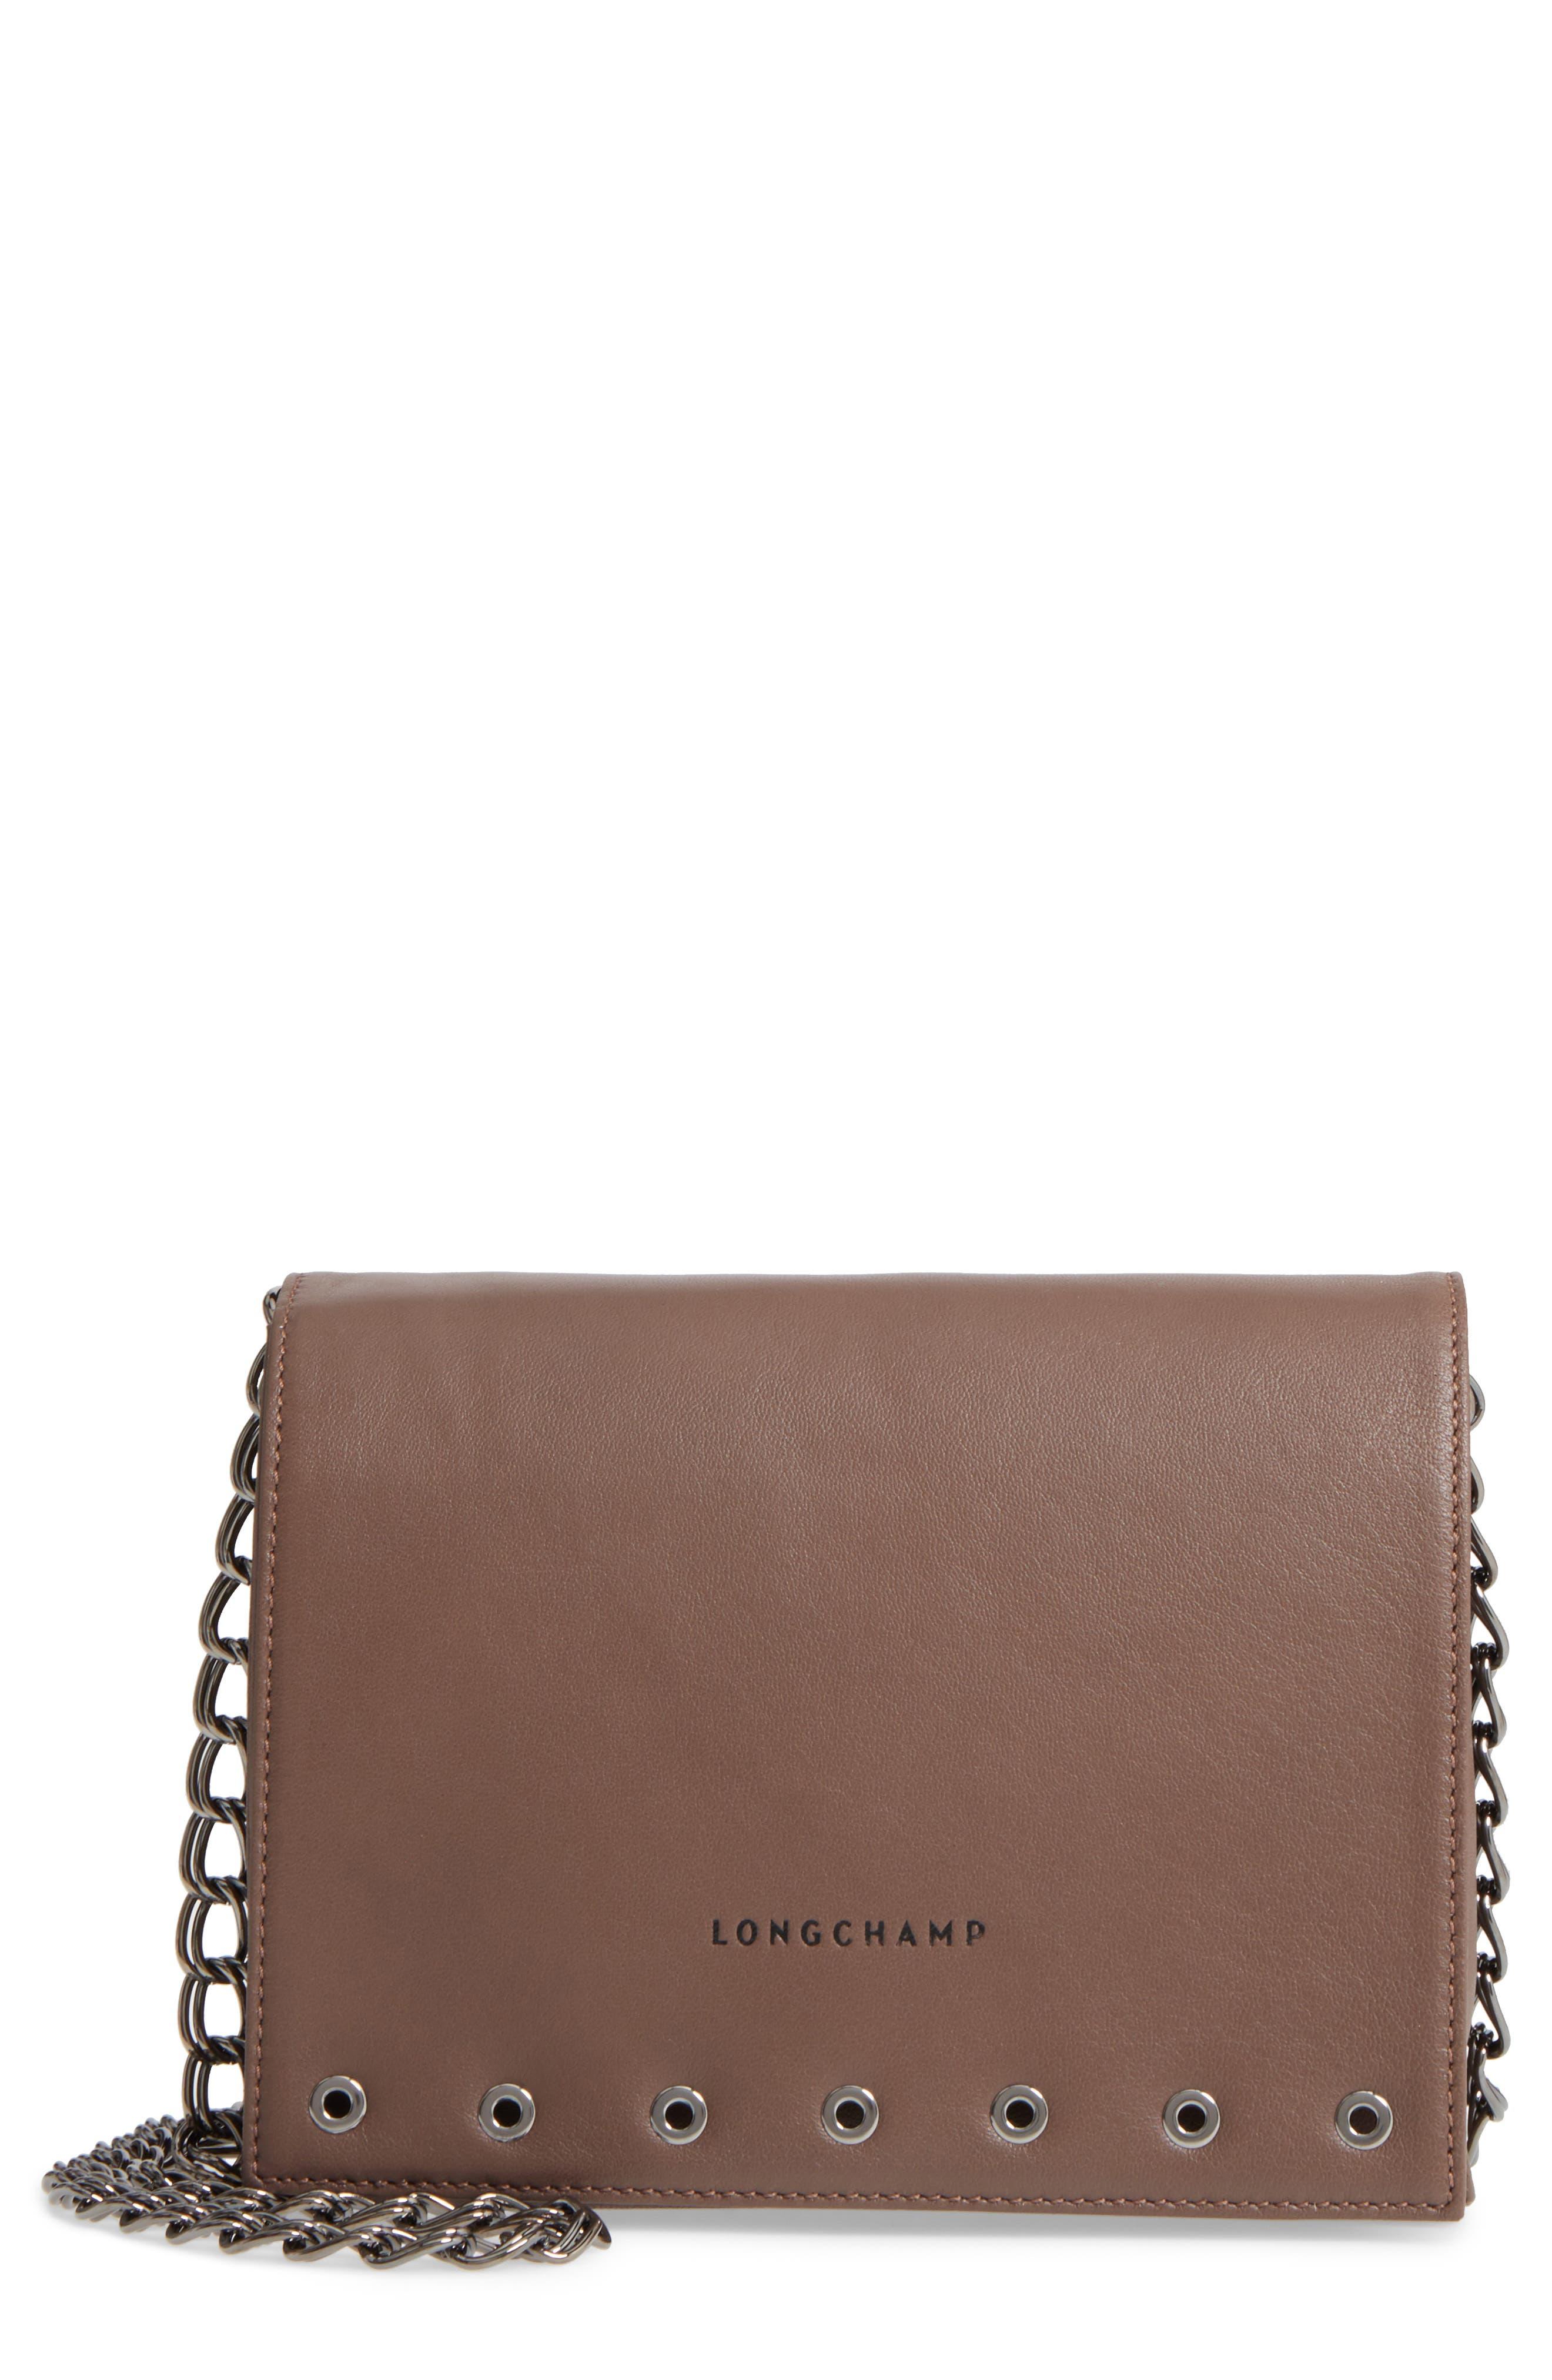 Longchamp Paris Rocks Crossbody Bag